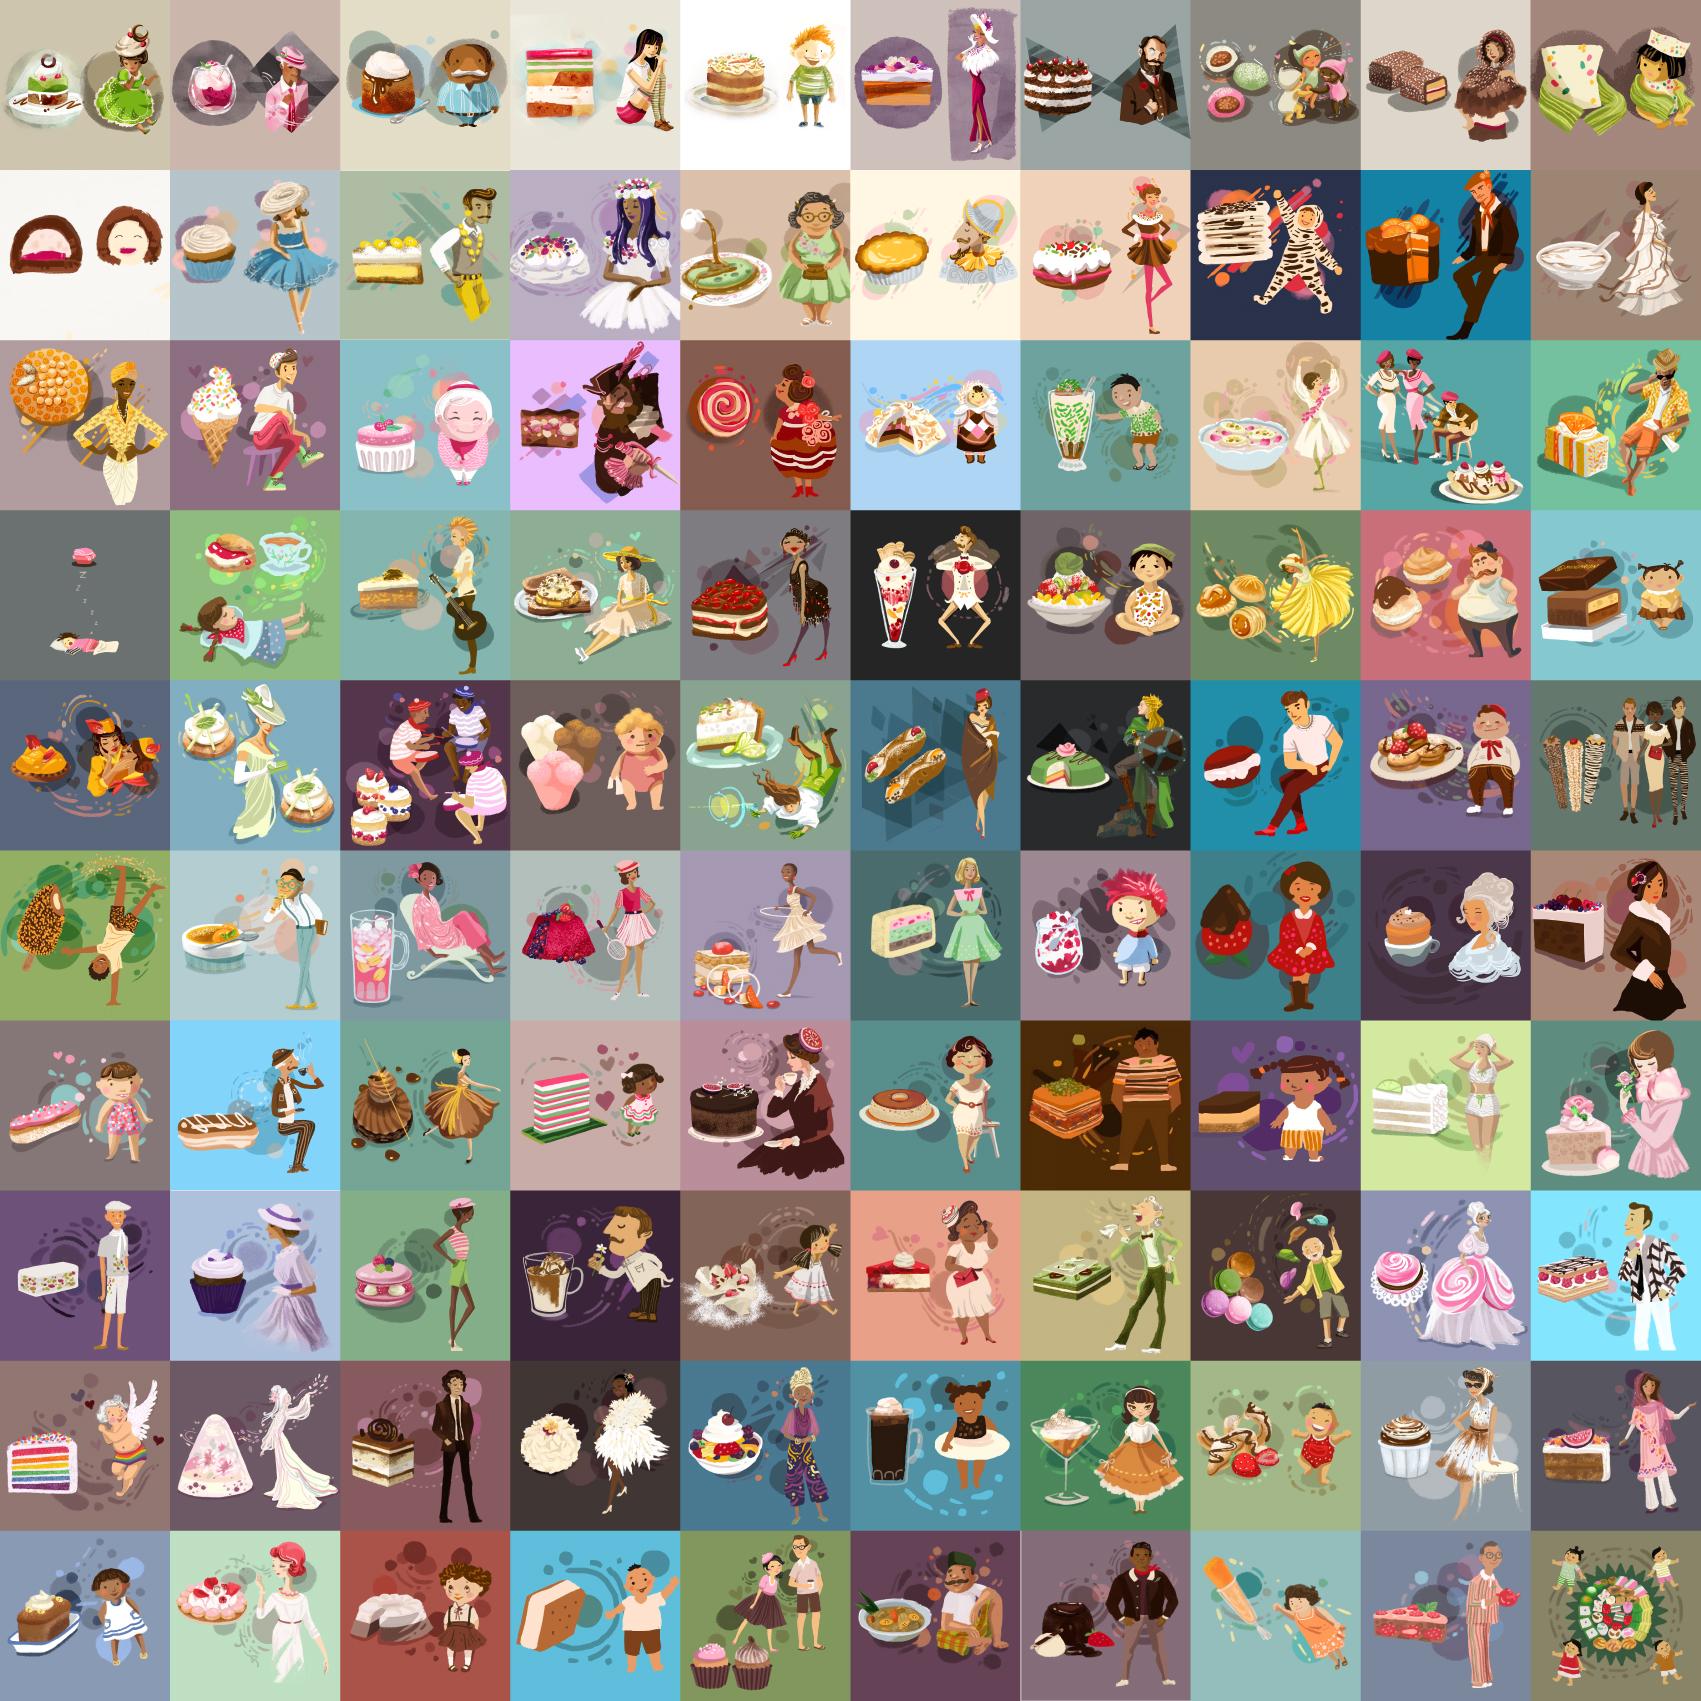 100_pics_All.jpg